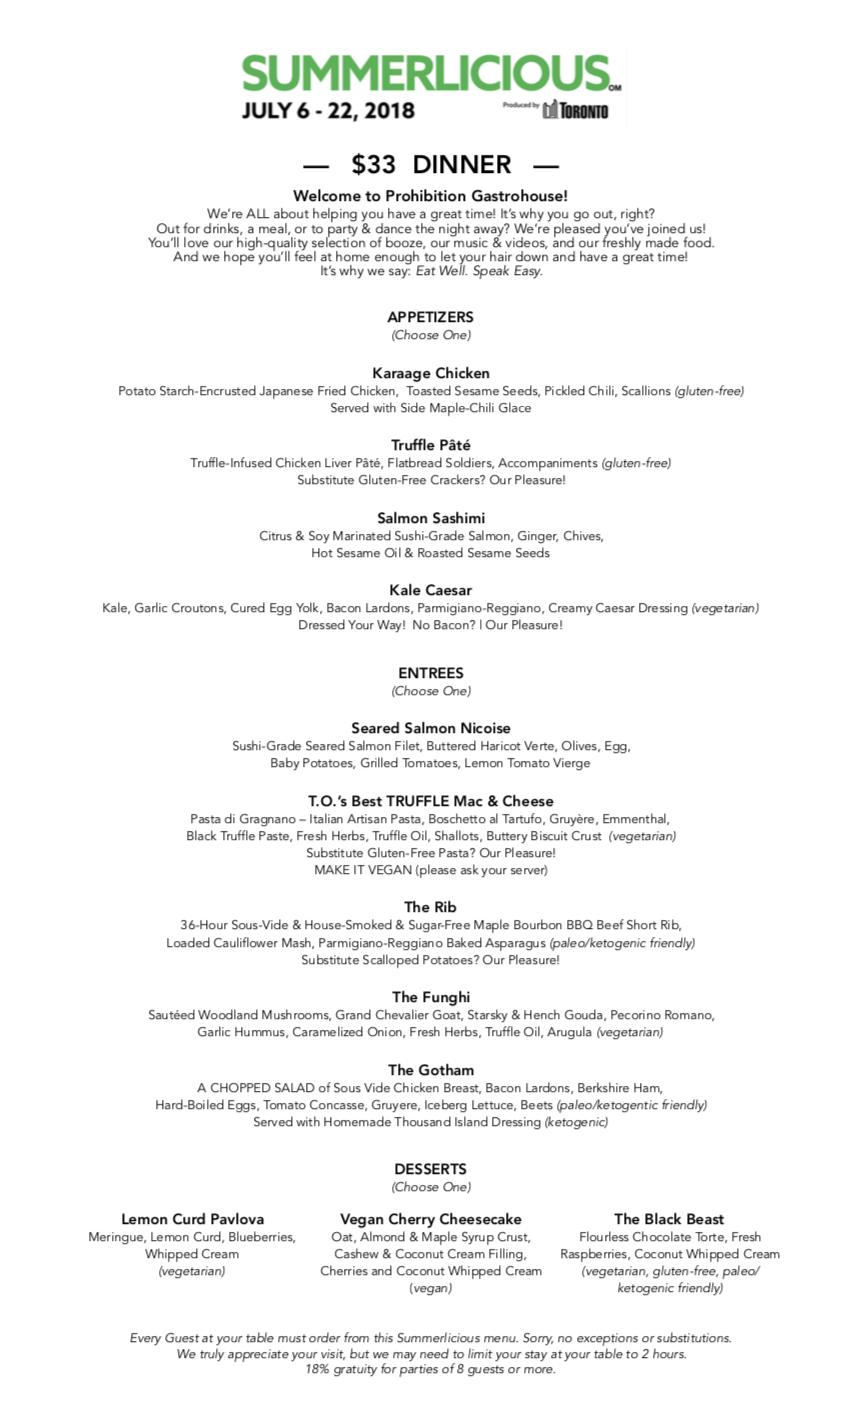 Prohibition Gastrohouse - Summerlicious 2018 Dinner Menu